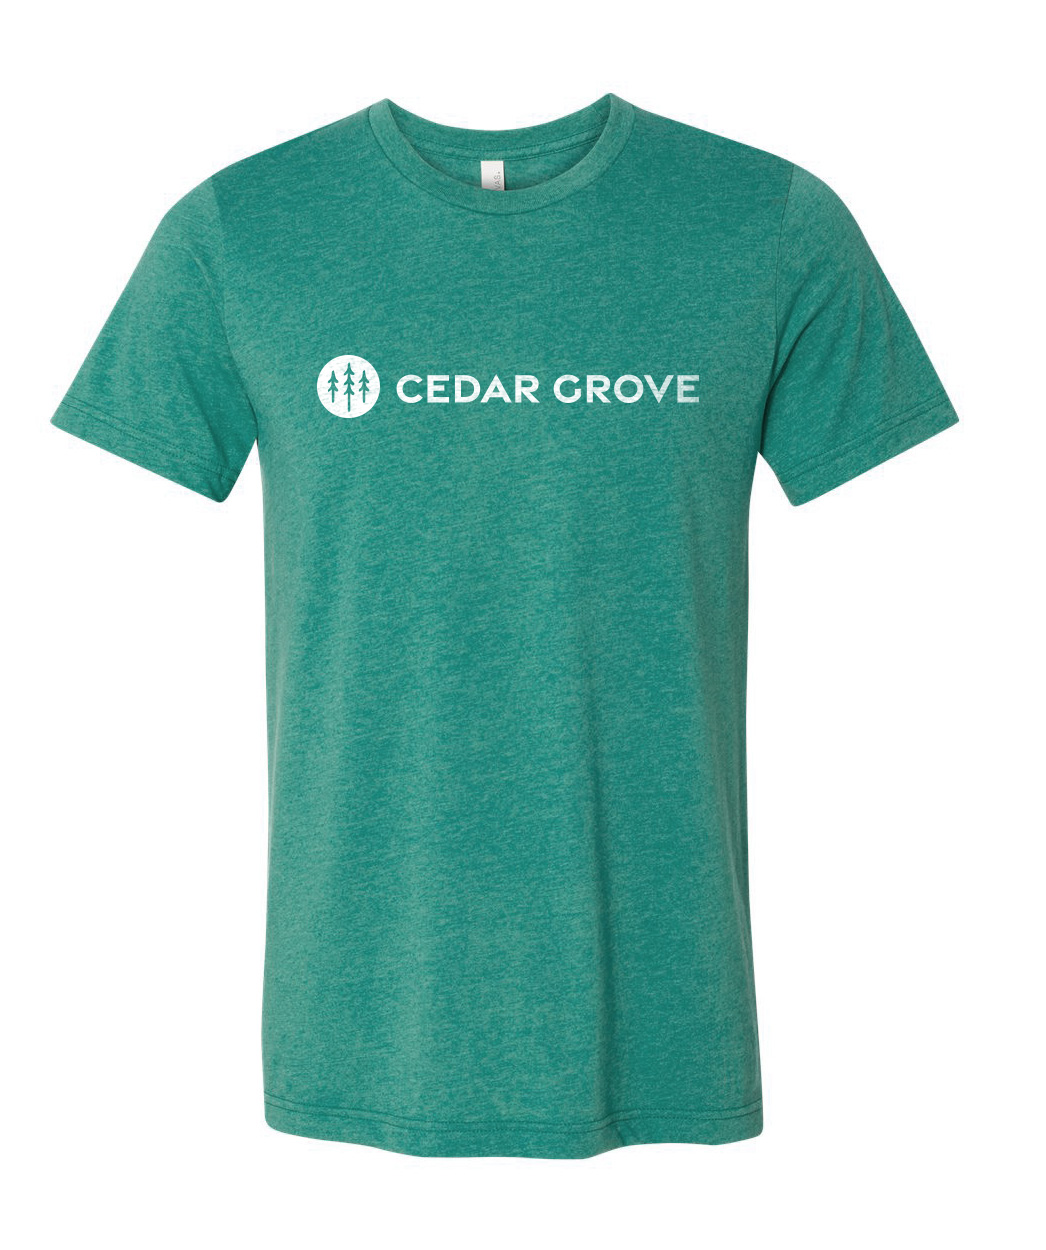 cg-shirts